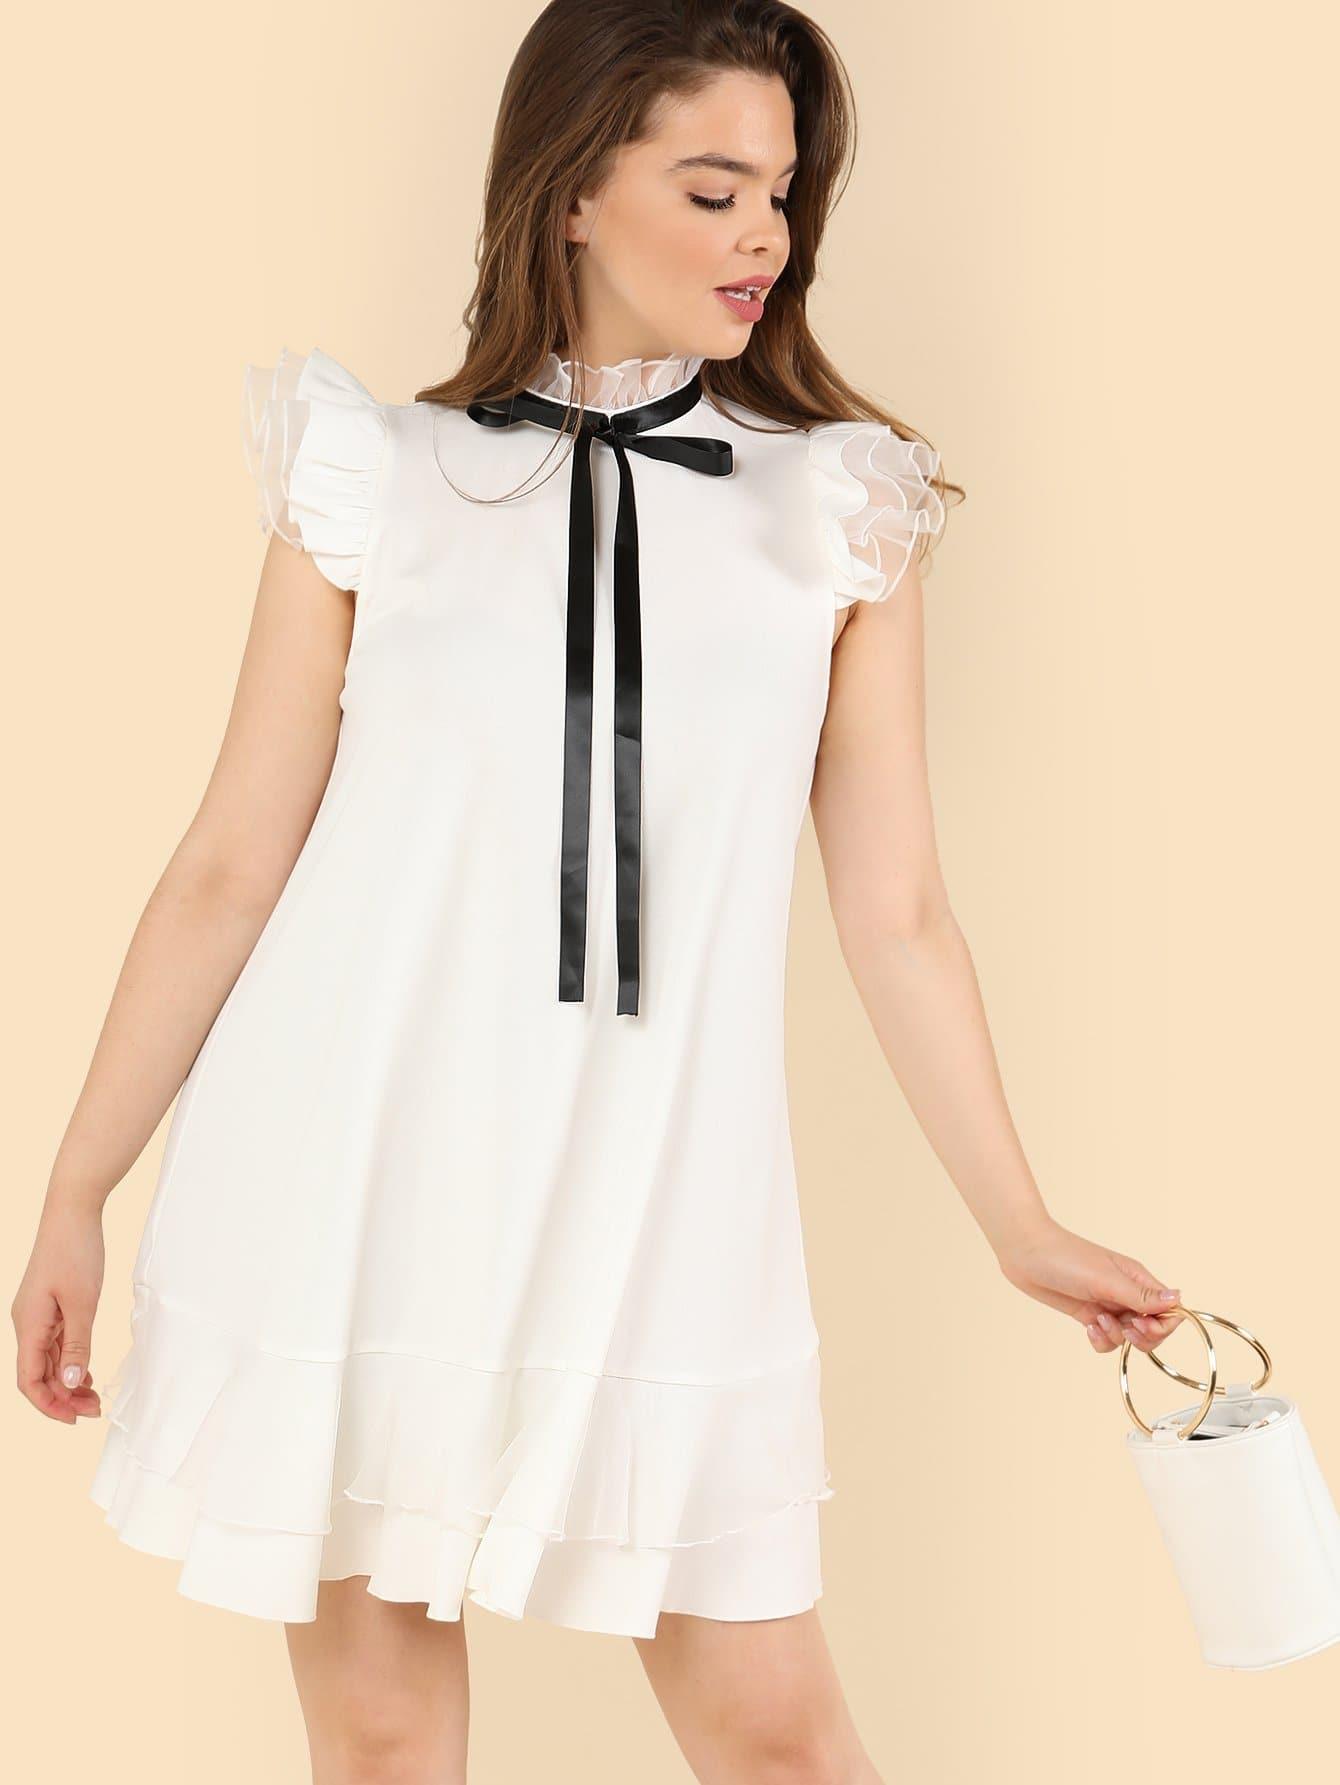 Tie Neck Layered Ruffle Trim Dress burgundy contrast sheer neck layered sleeve ruffle dress